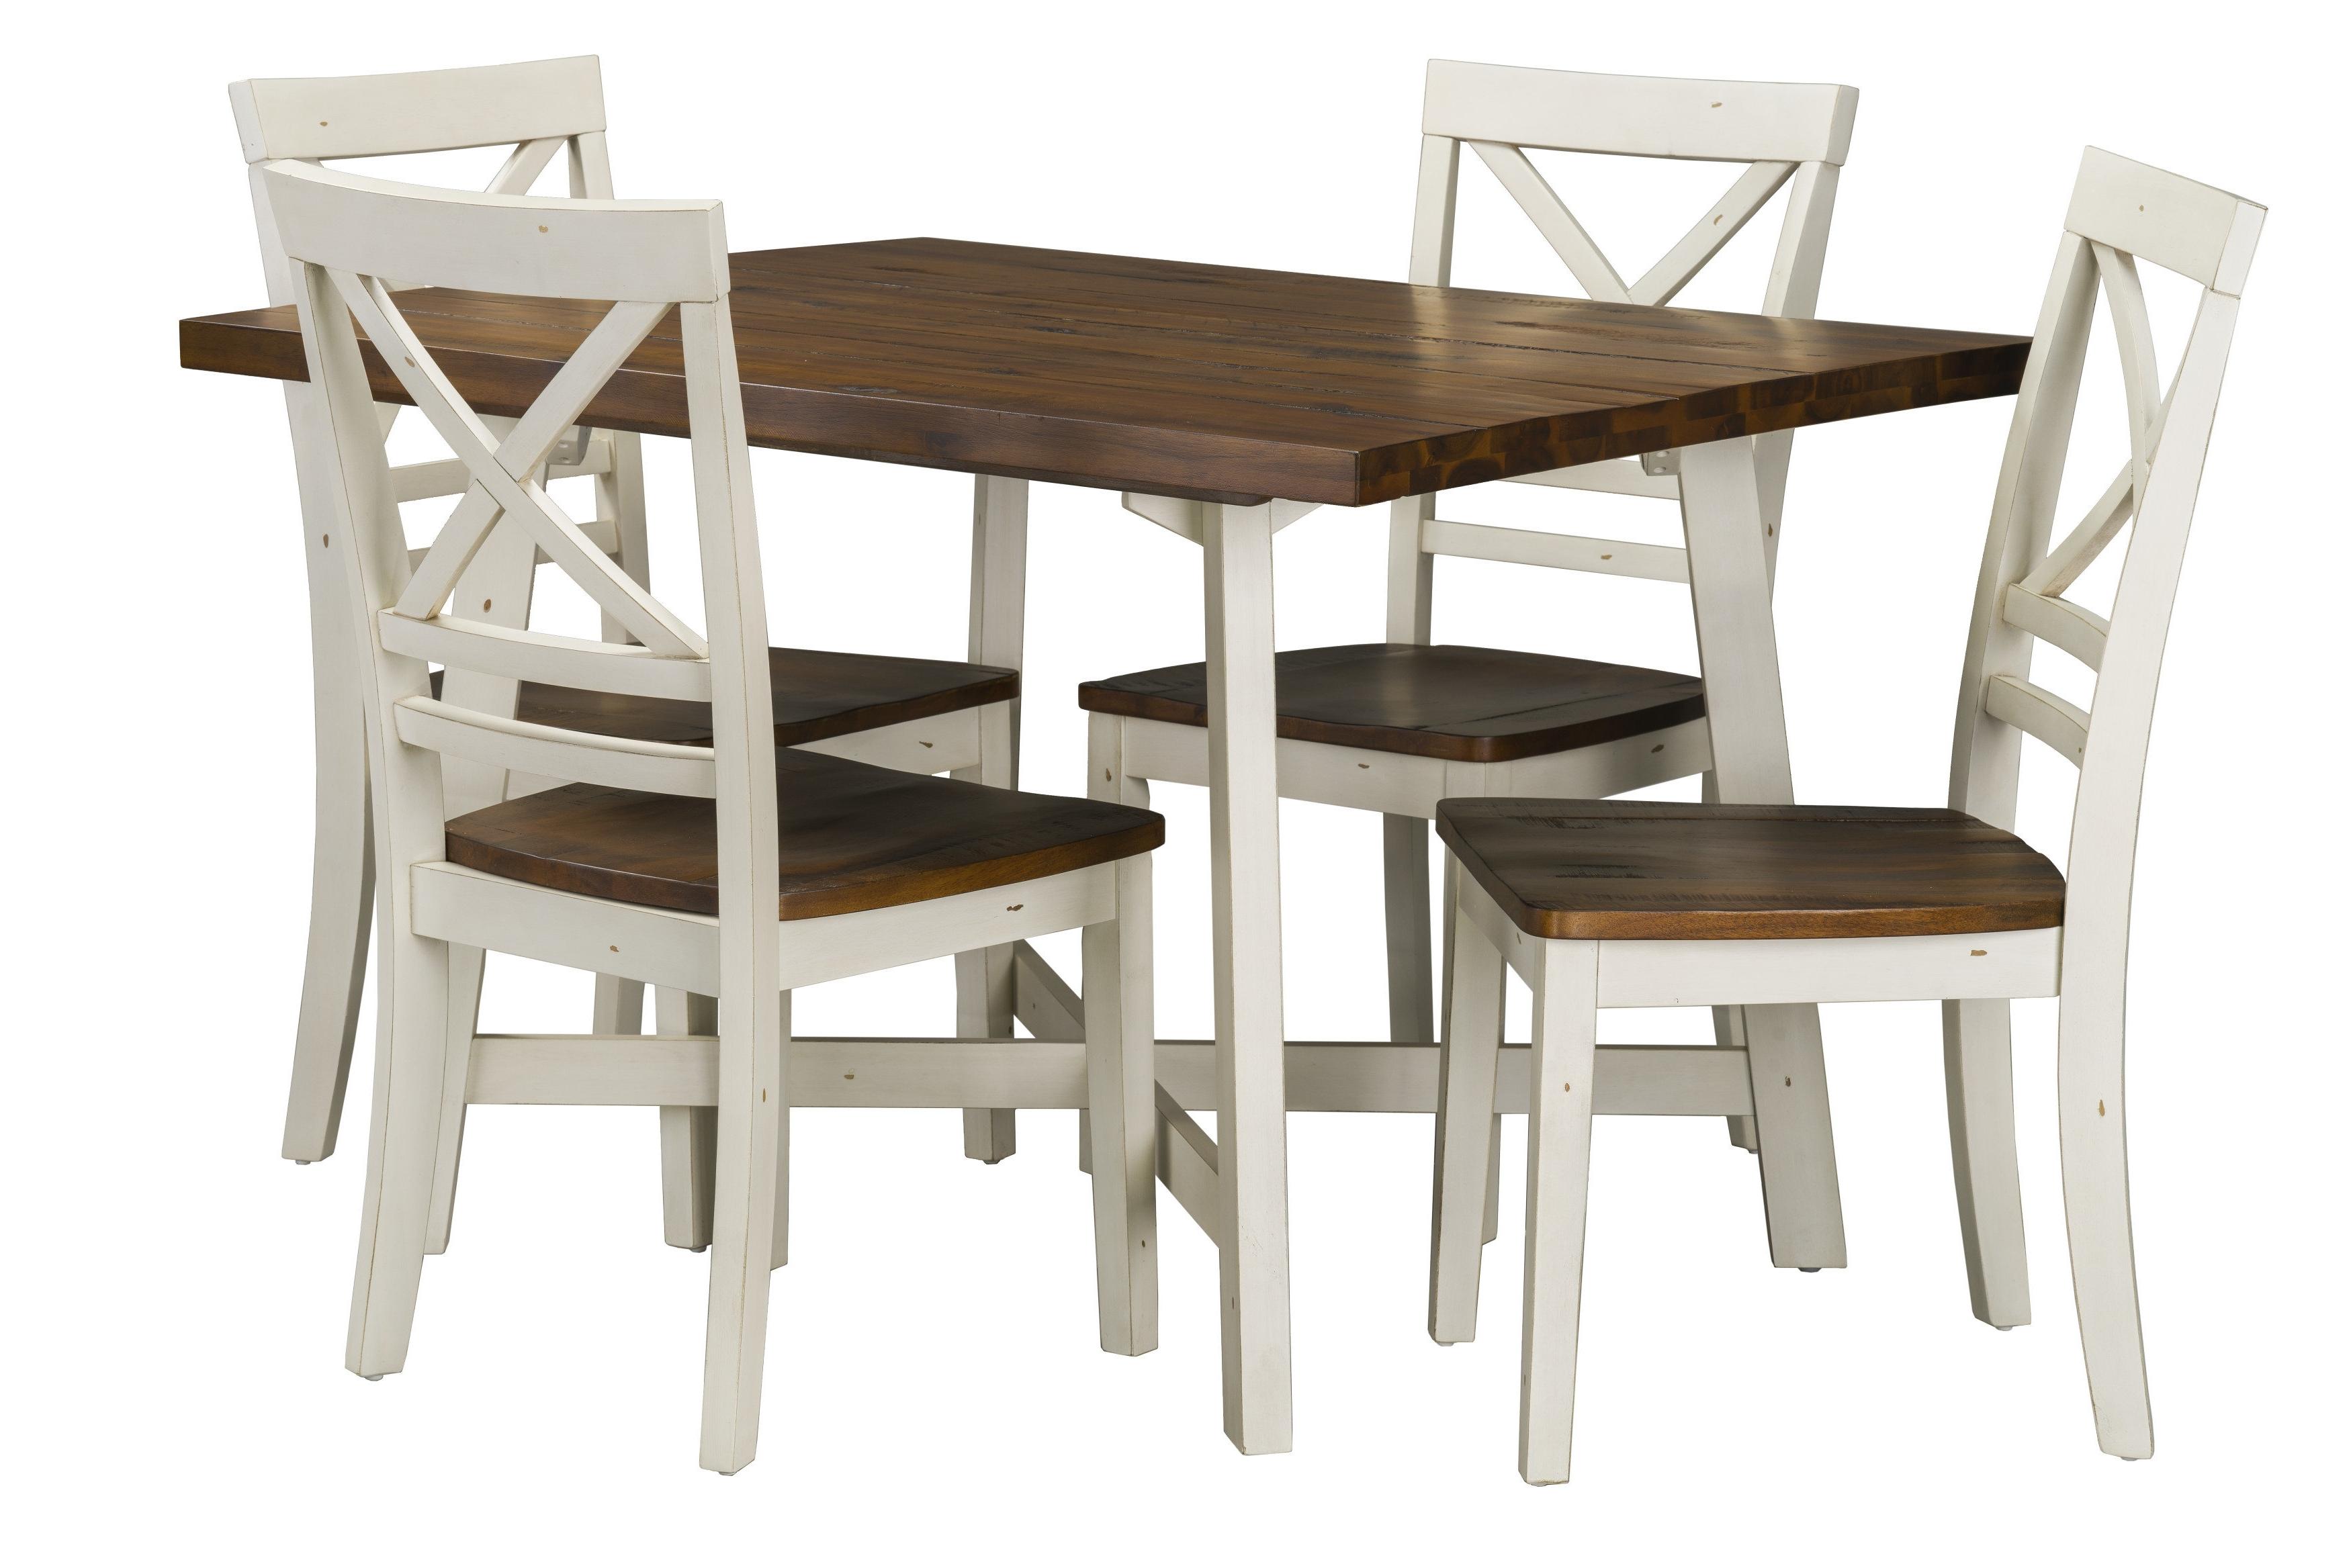 Cora 7 Piece Dining Sets Regarding Latest Dunnes 5 Piece Dining Set & Reviews (View 7 of 25)